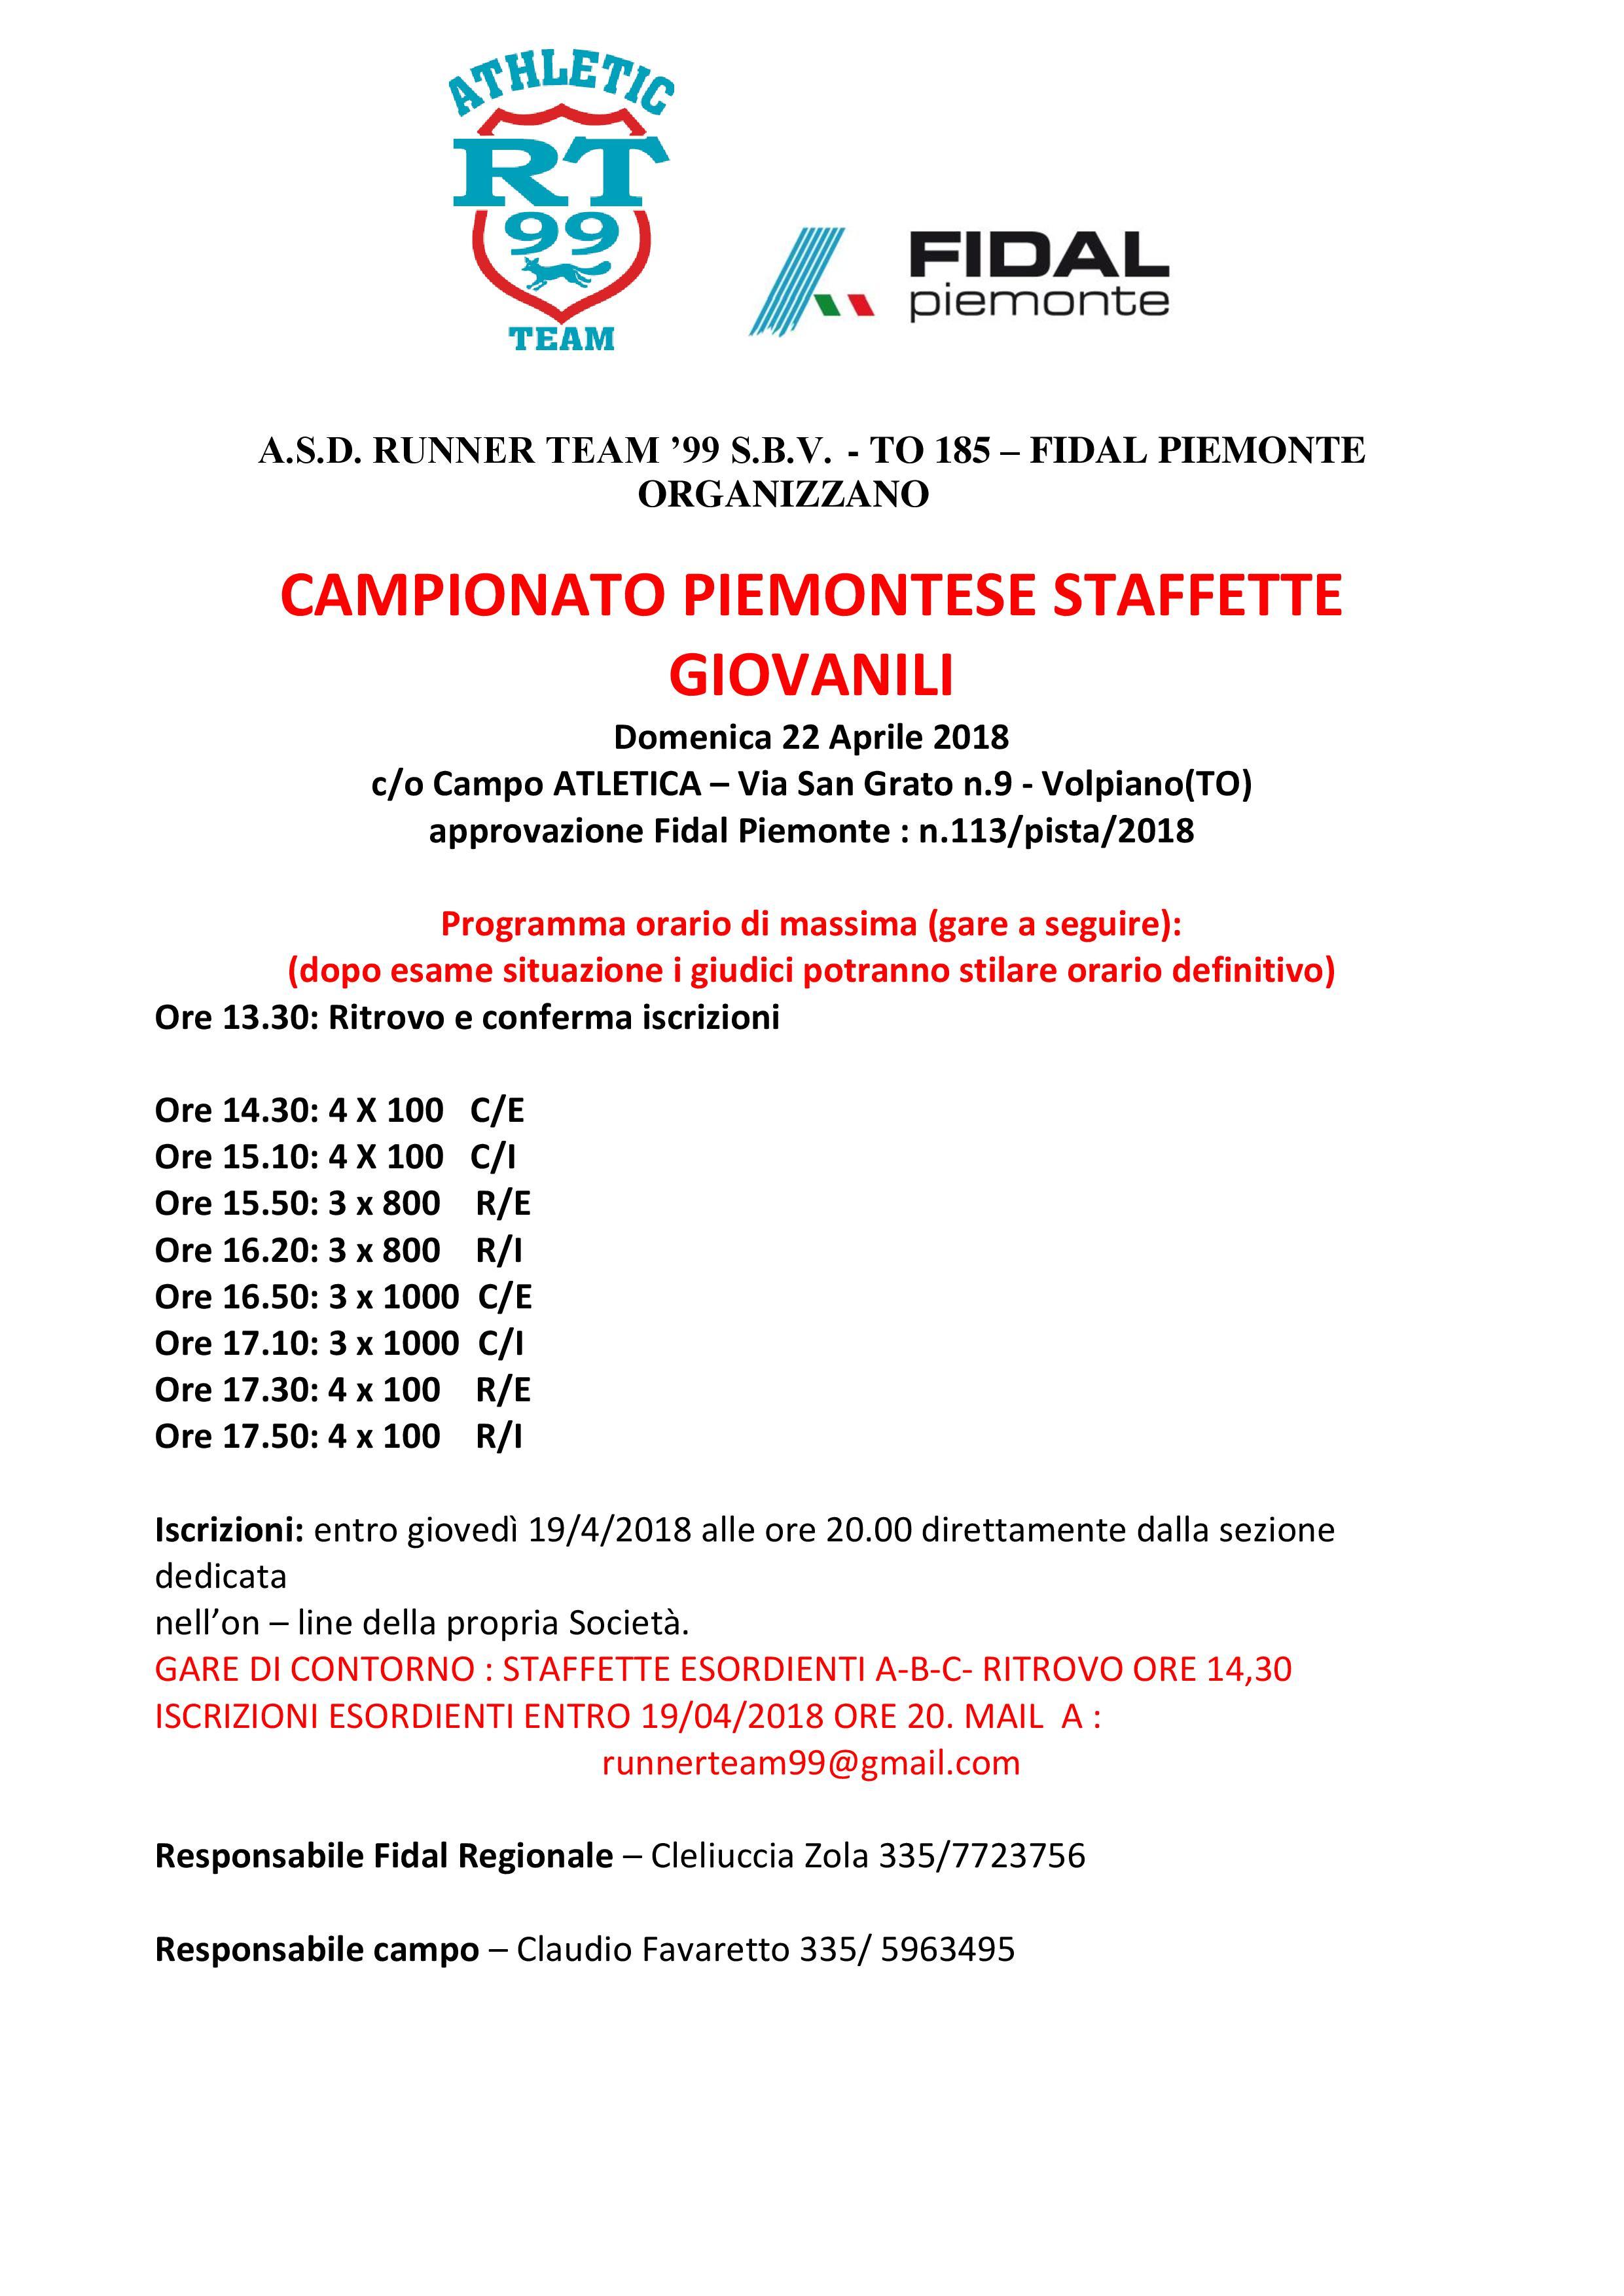 2018 04 22 Volpiano dispositivo pista regionale-page-001